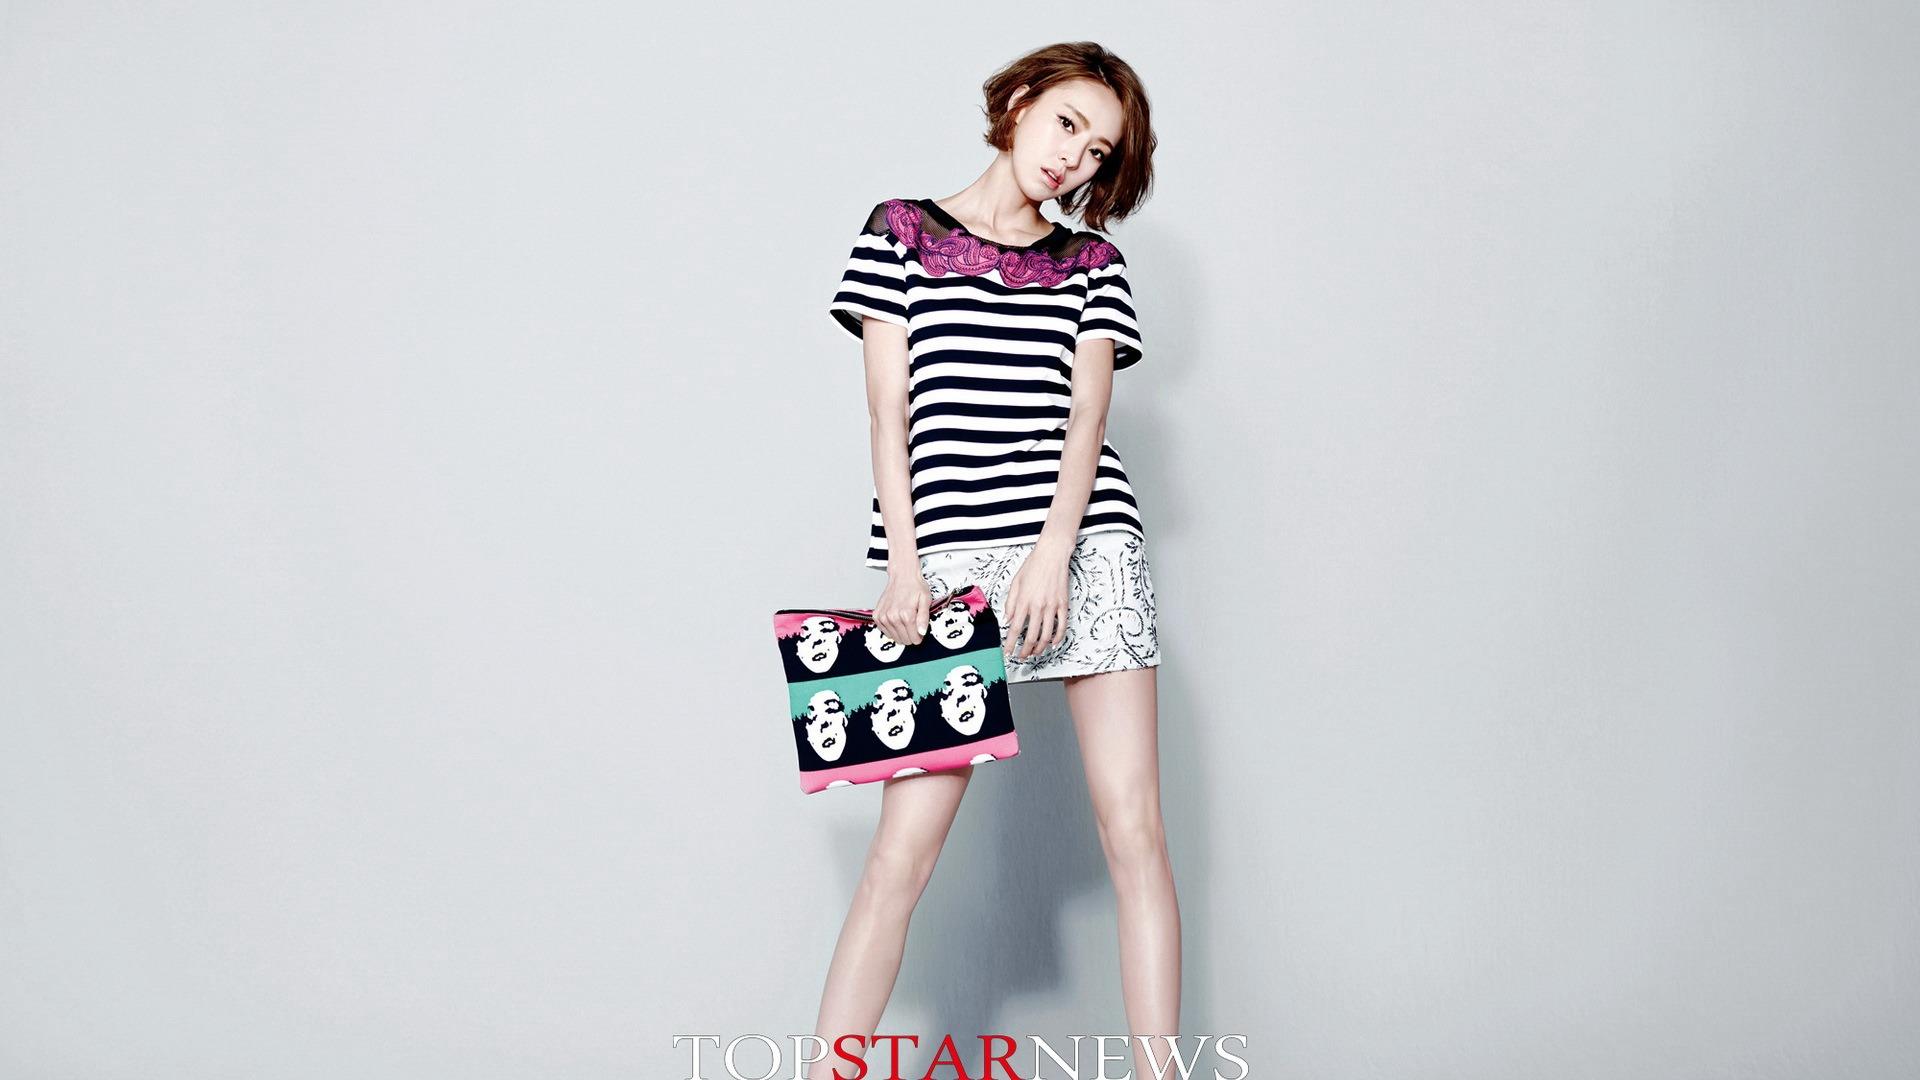 Lee Da Hae 韓国の美しさのスターの写真の壁紙プレビュー 10wallpaper Com